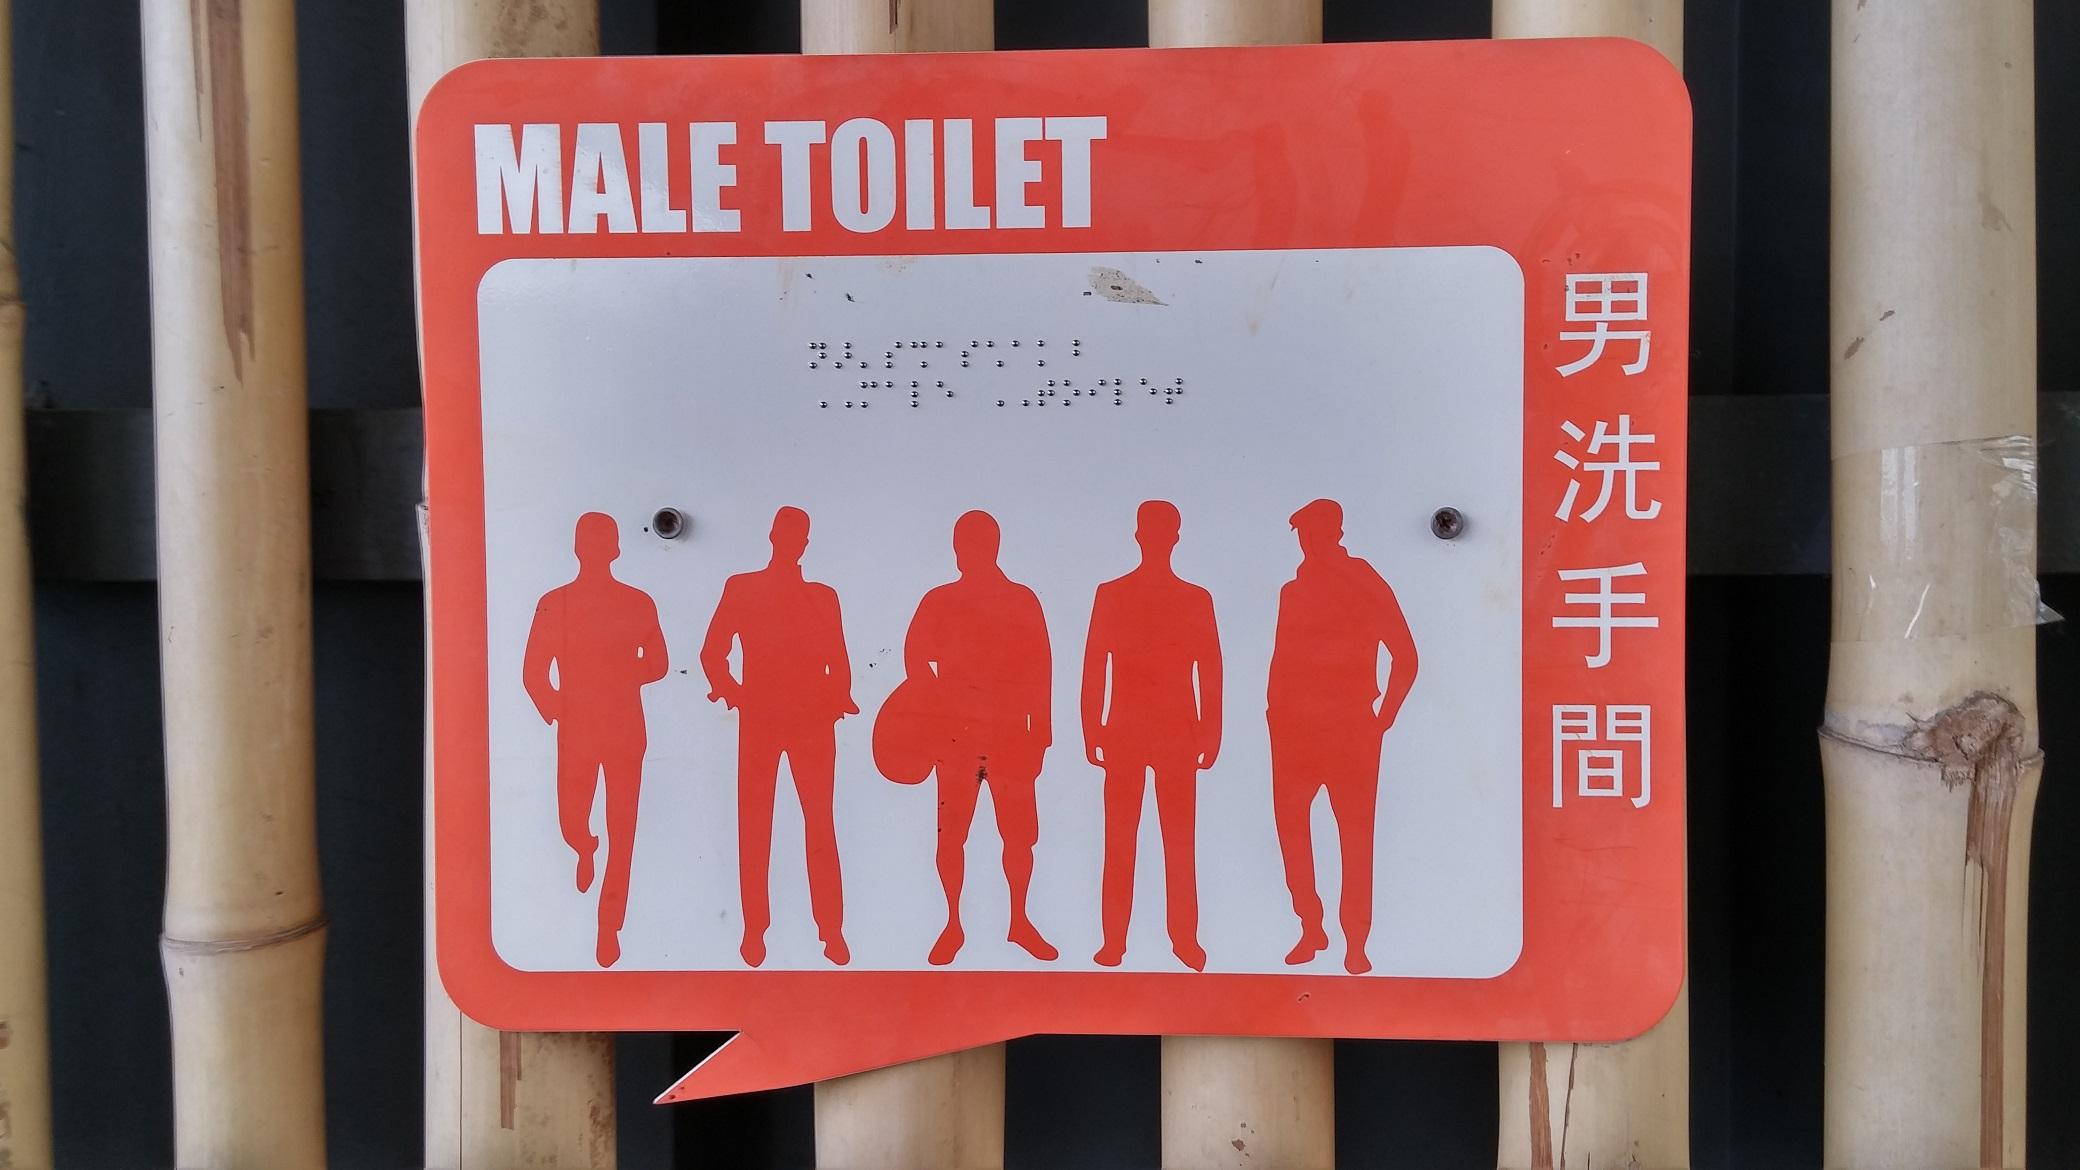 Kwun Tong Waterfront Promenade male toilet sign